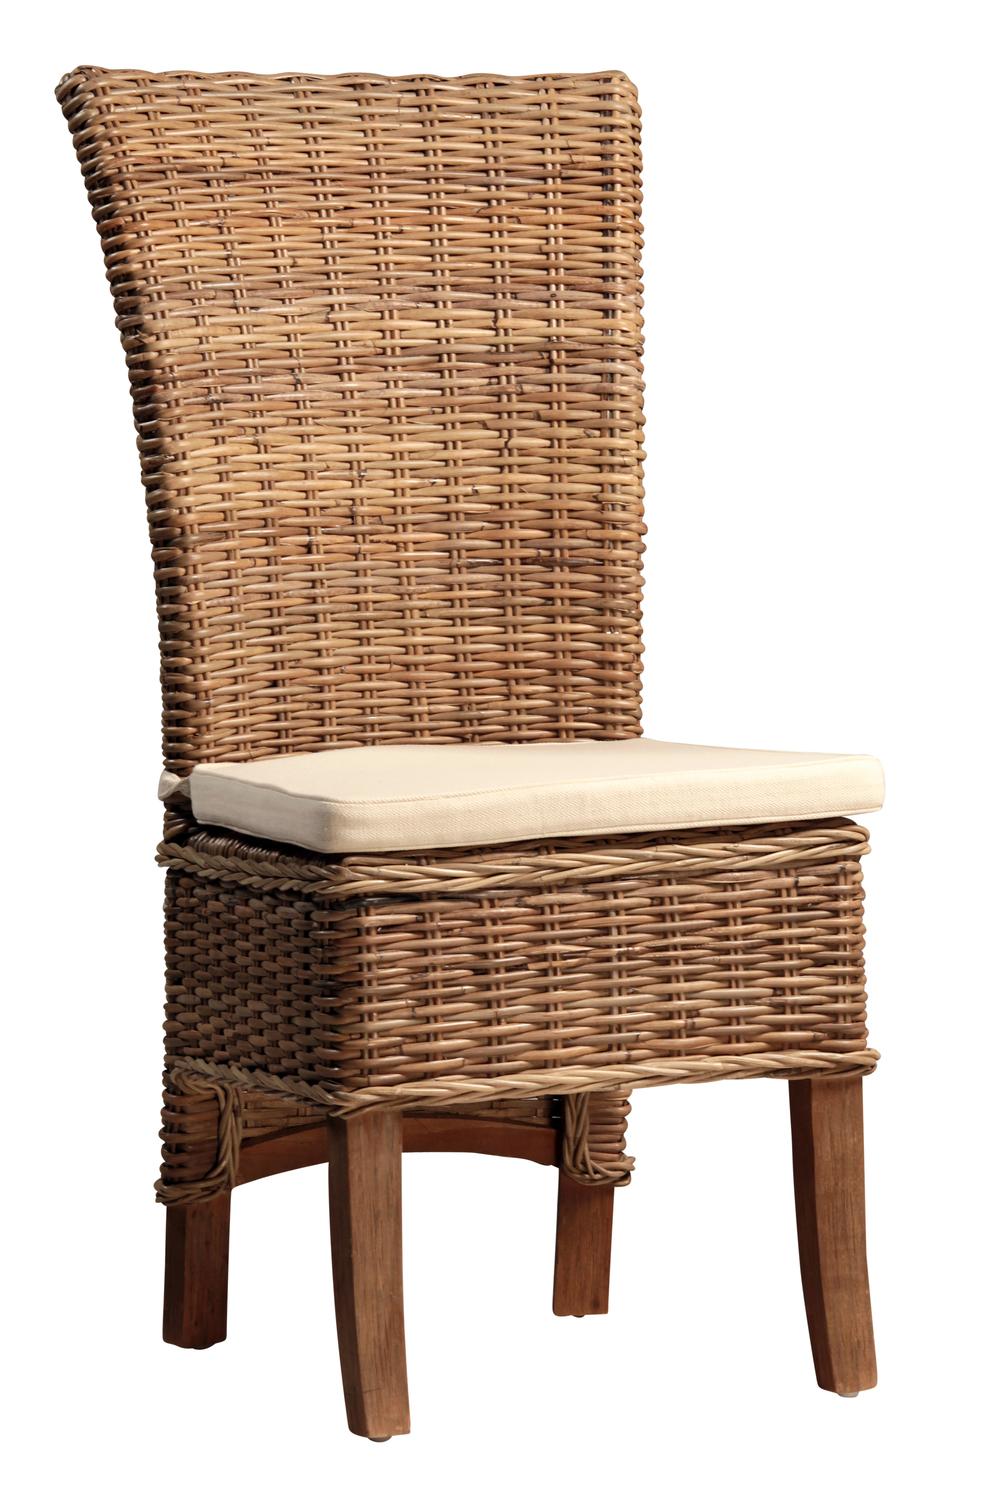 Dovetail Furniture - Preston Chair